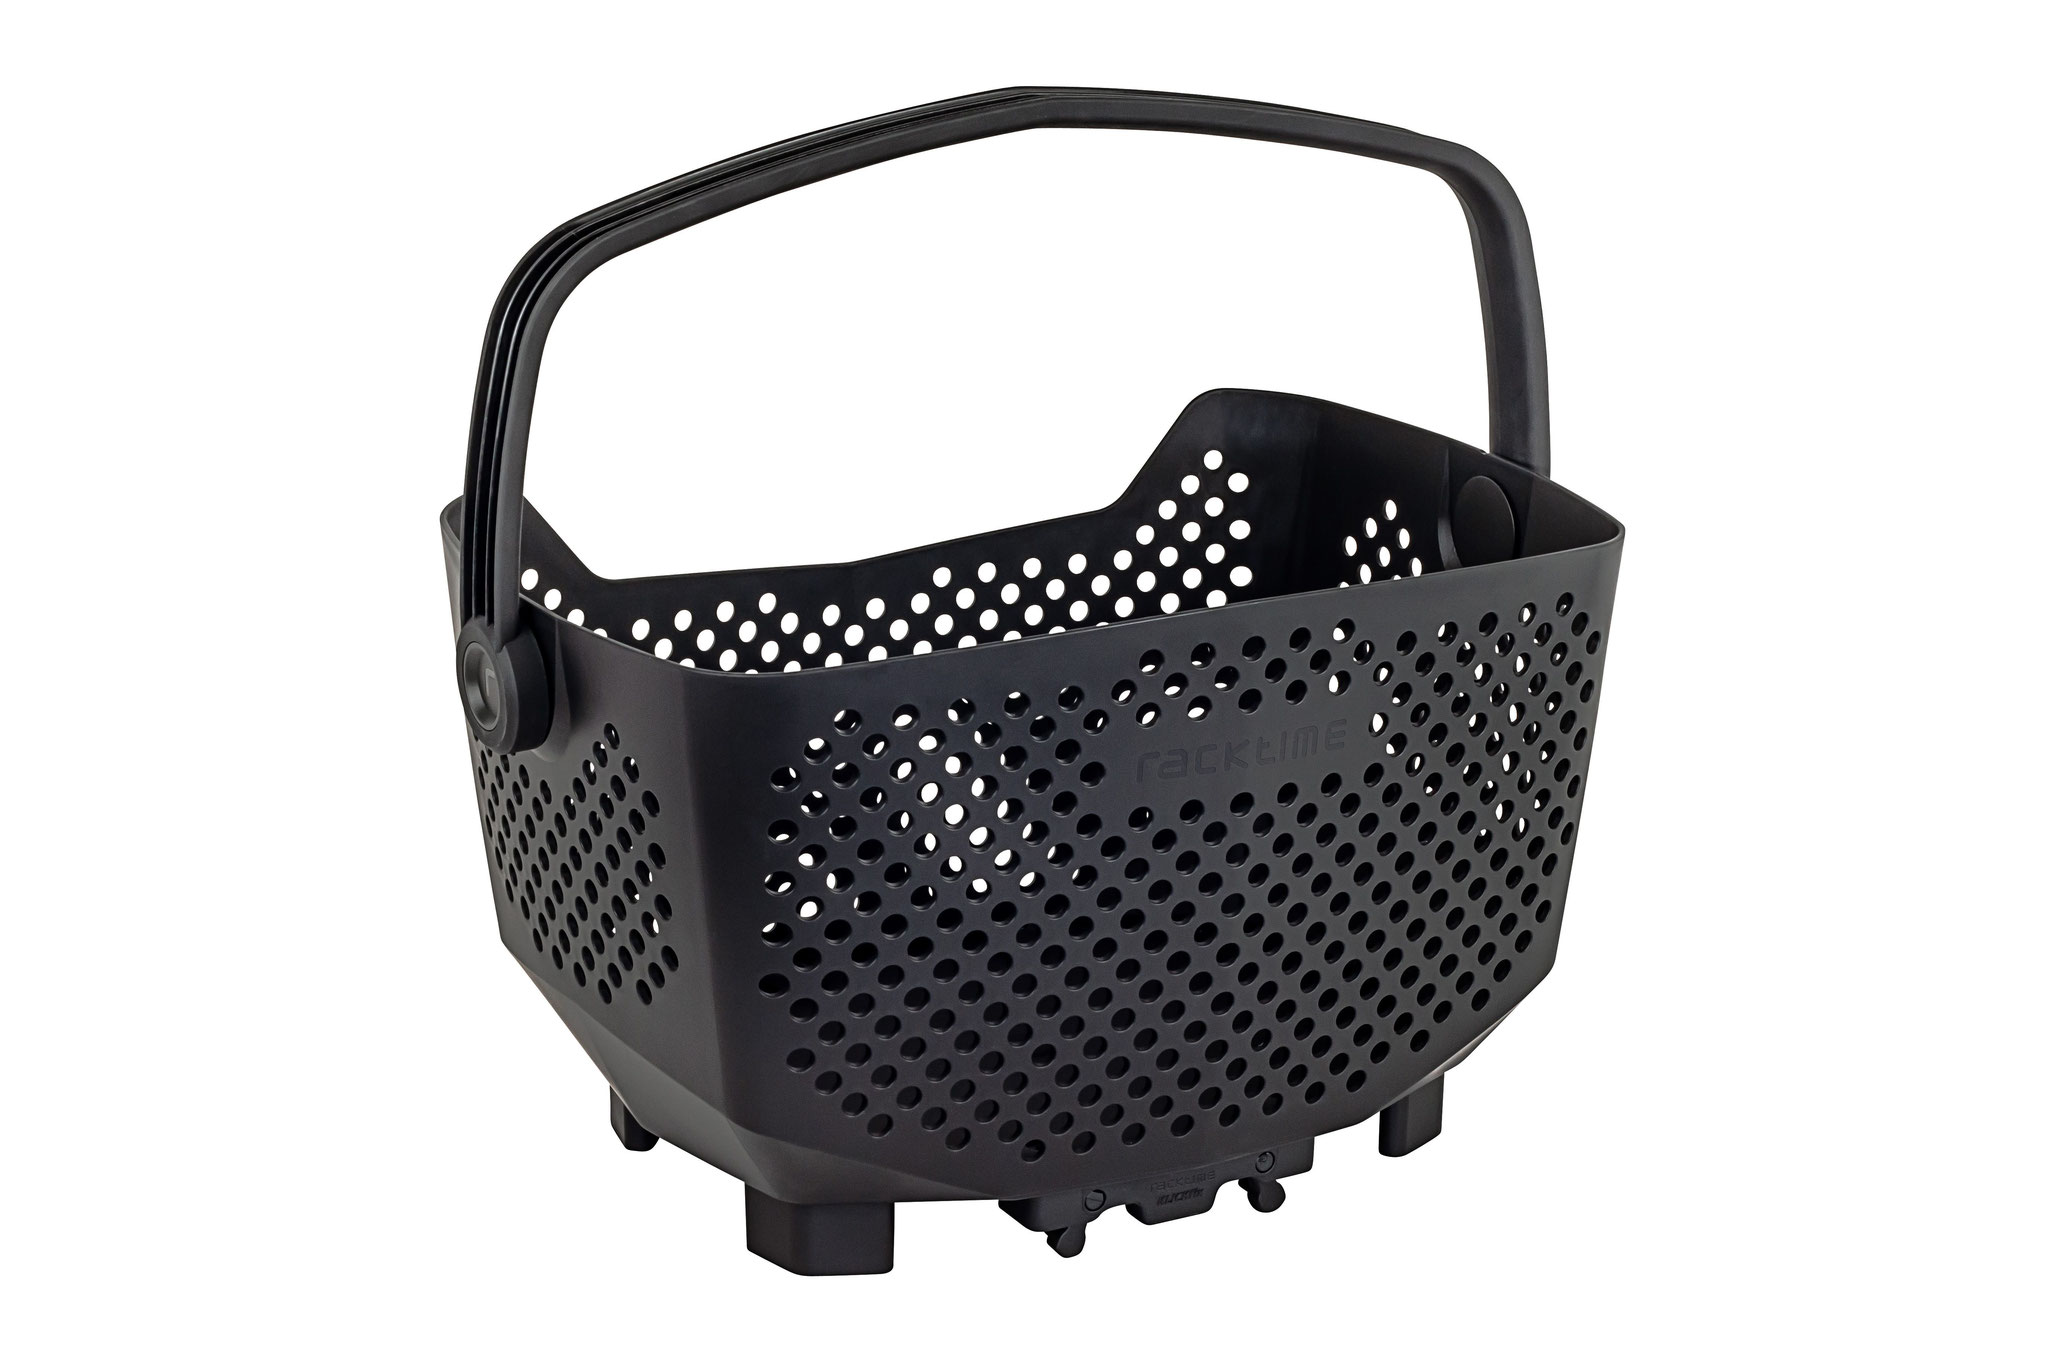 Basket Edge -  Copyright: HEBIE GmbH & Co. KG